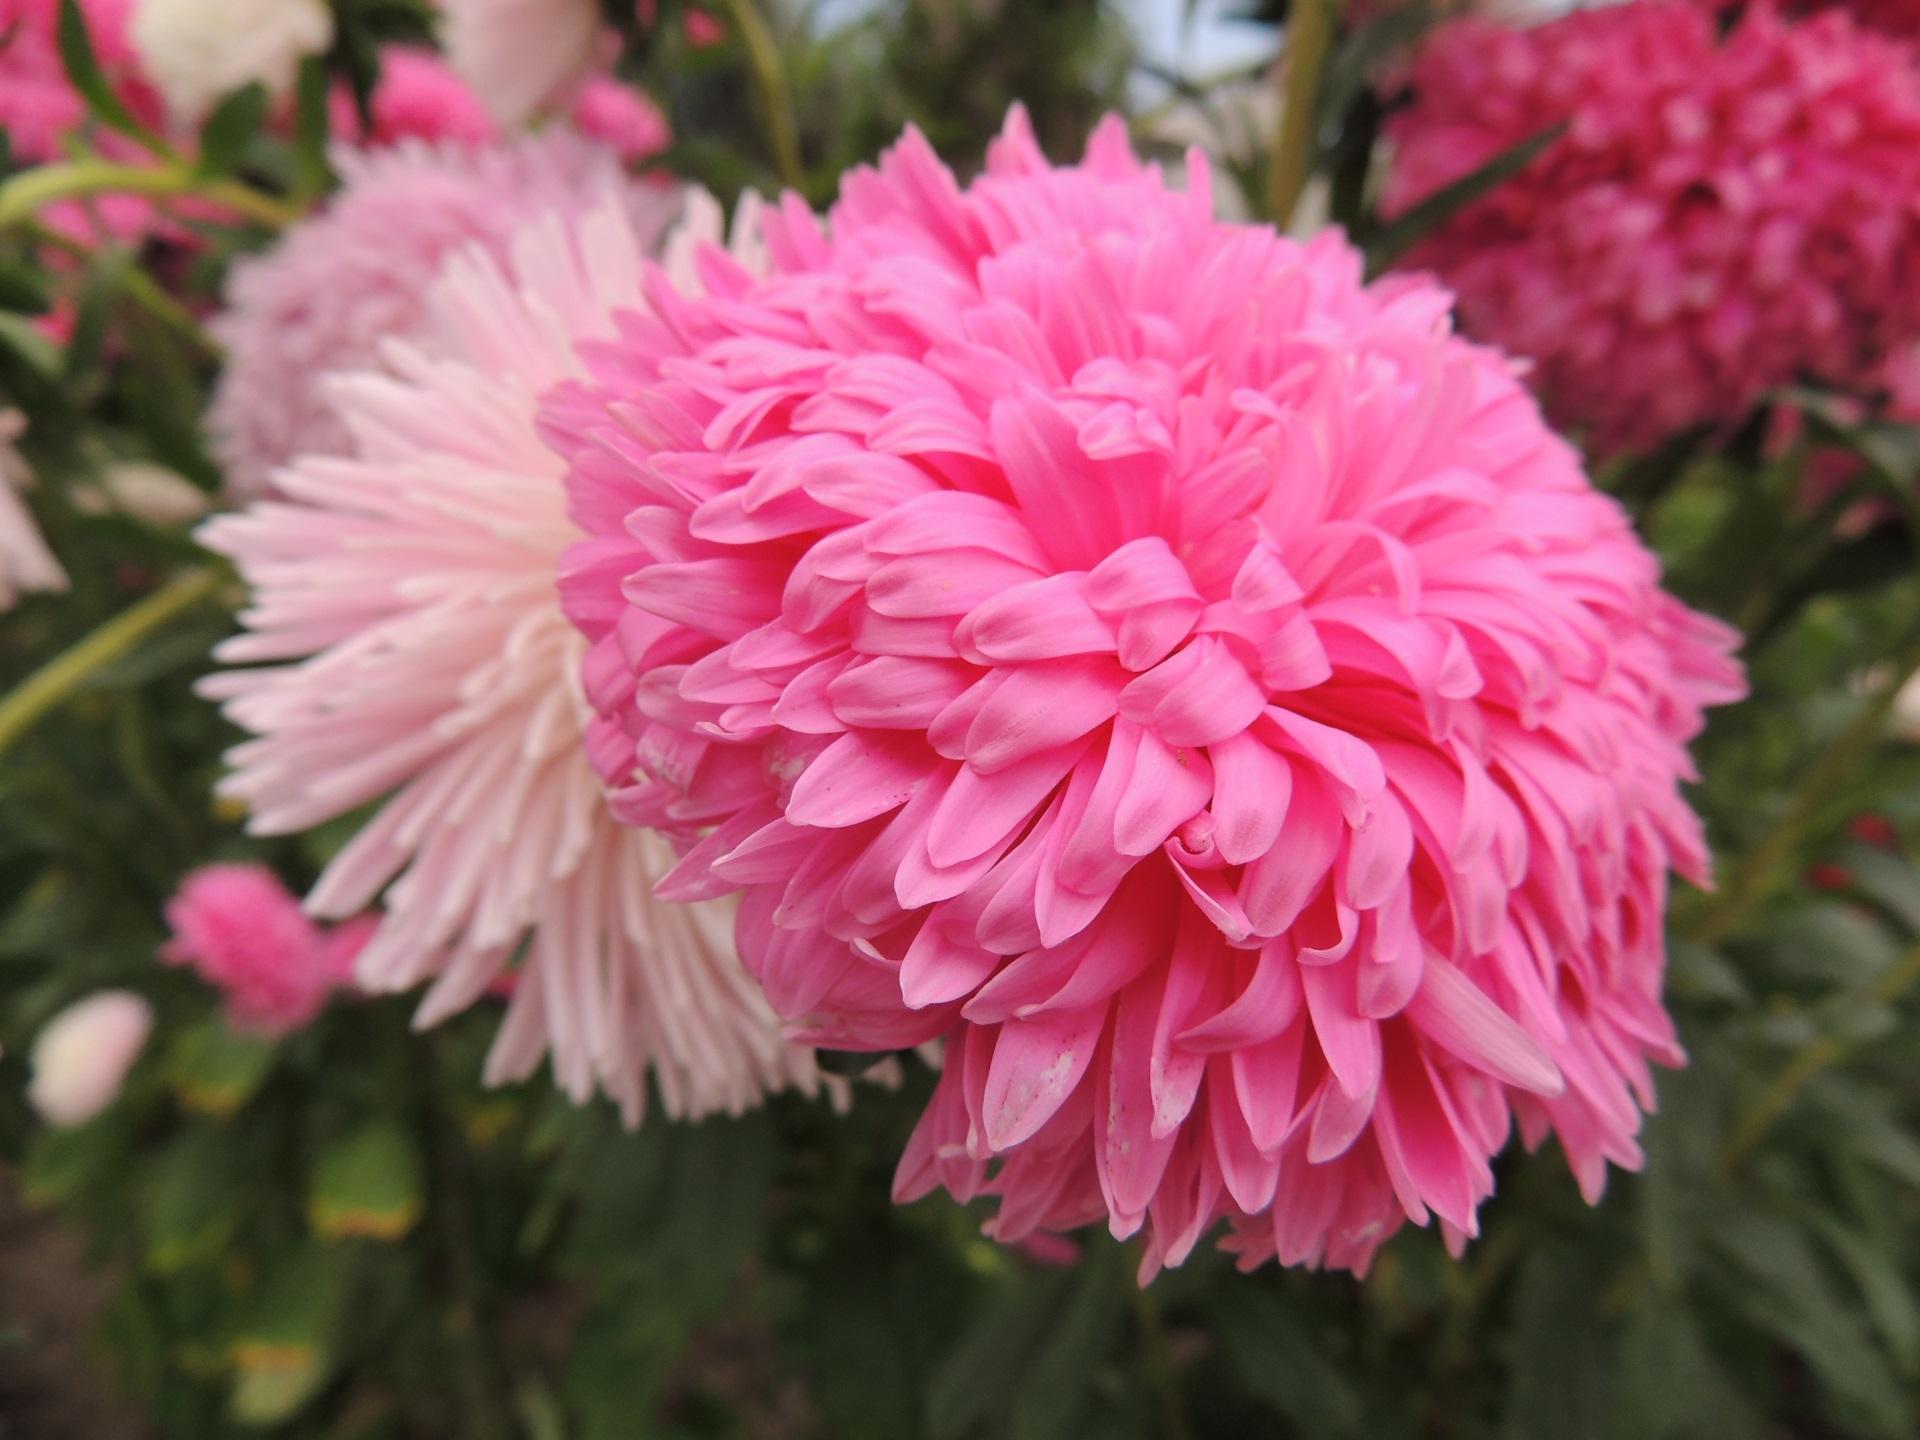 Eden Project Pink Flowers Kelvin Peach Photography